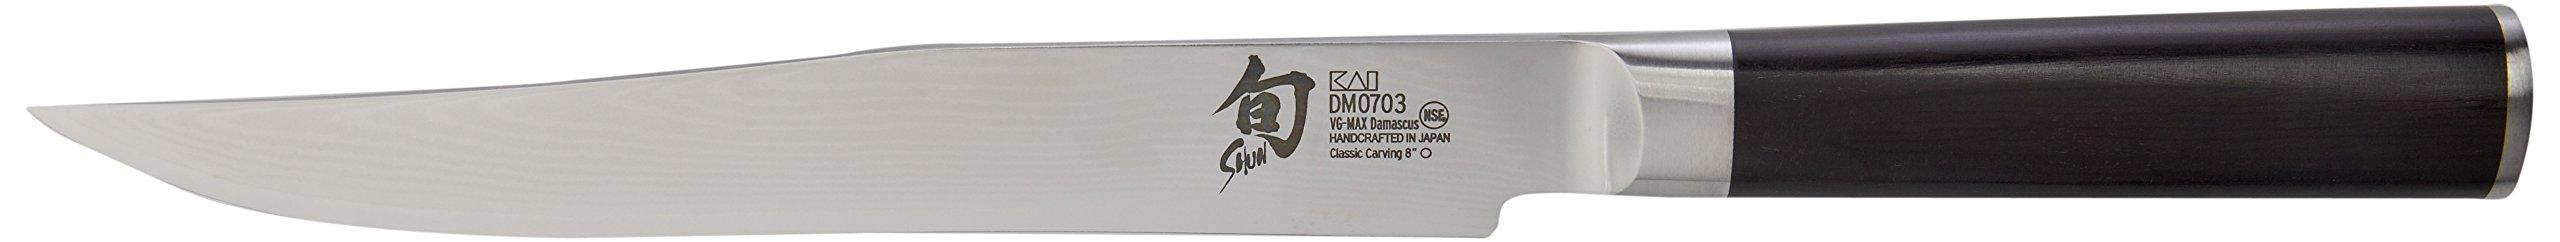 Shun Classic 8-Inch Carving Knife by Shun